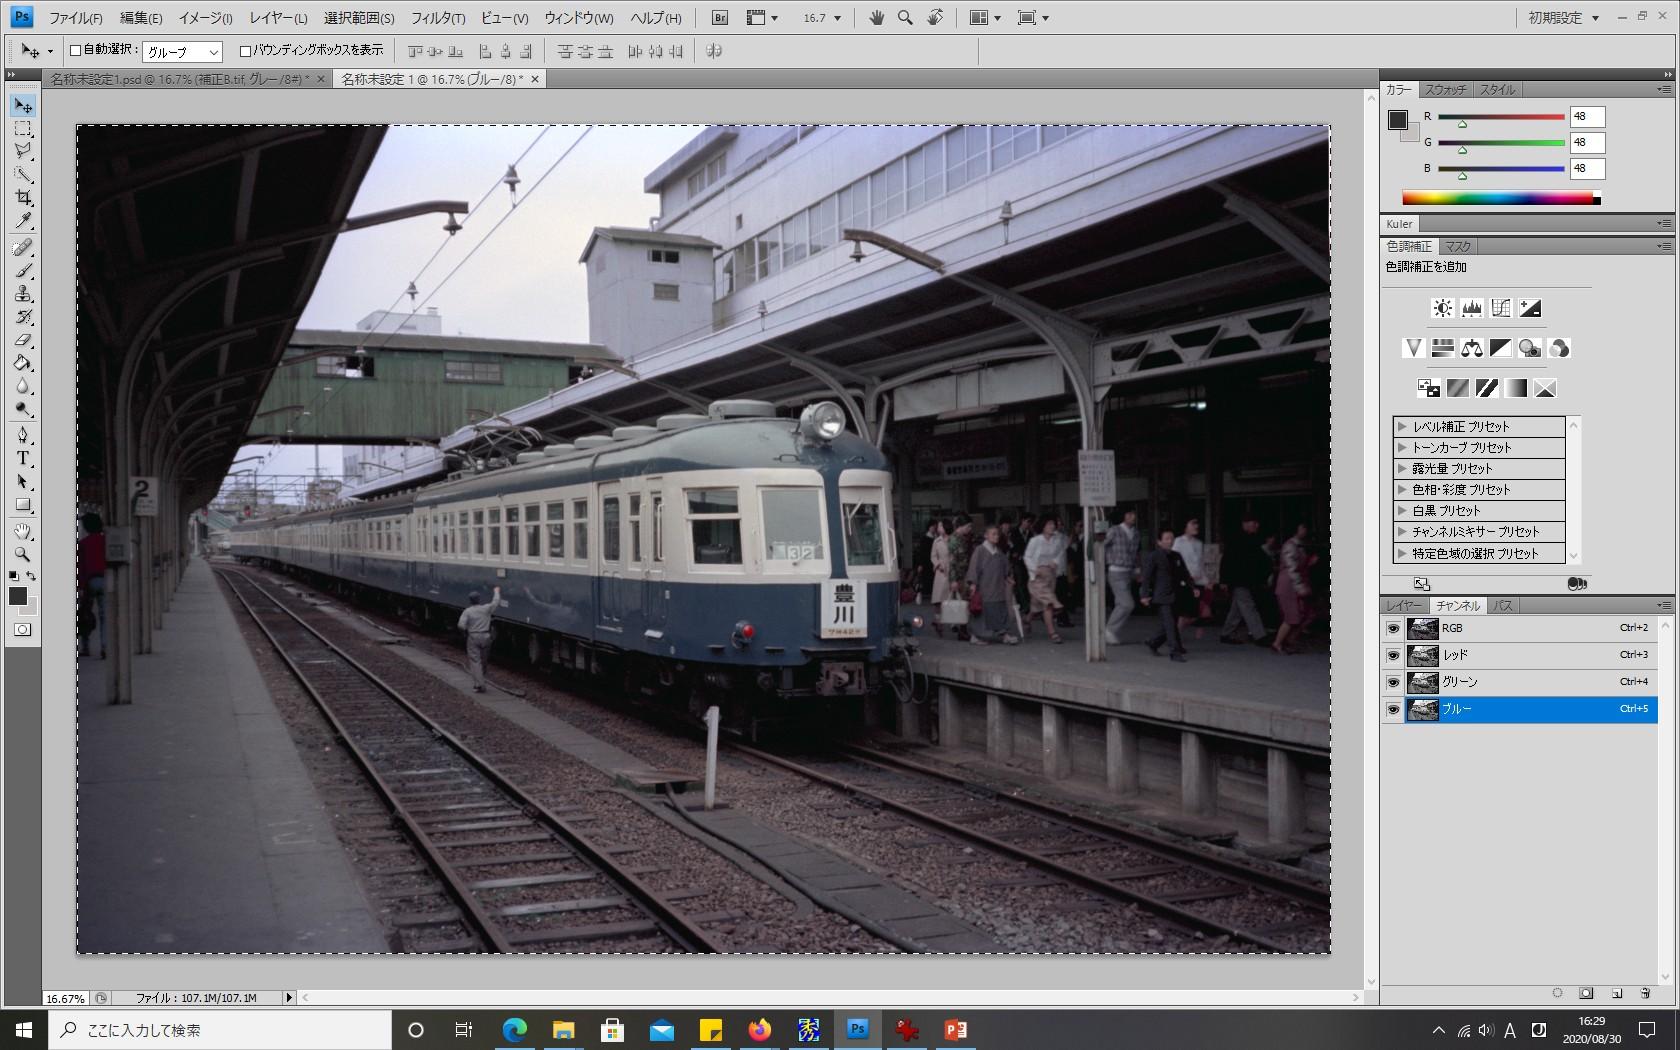 f:id:yasuo_ssi:20200830171337j:plain